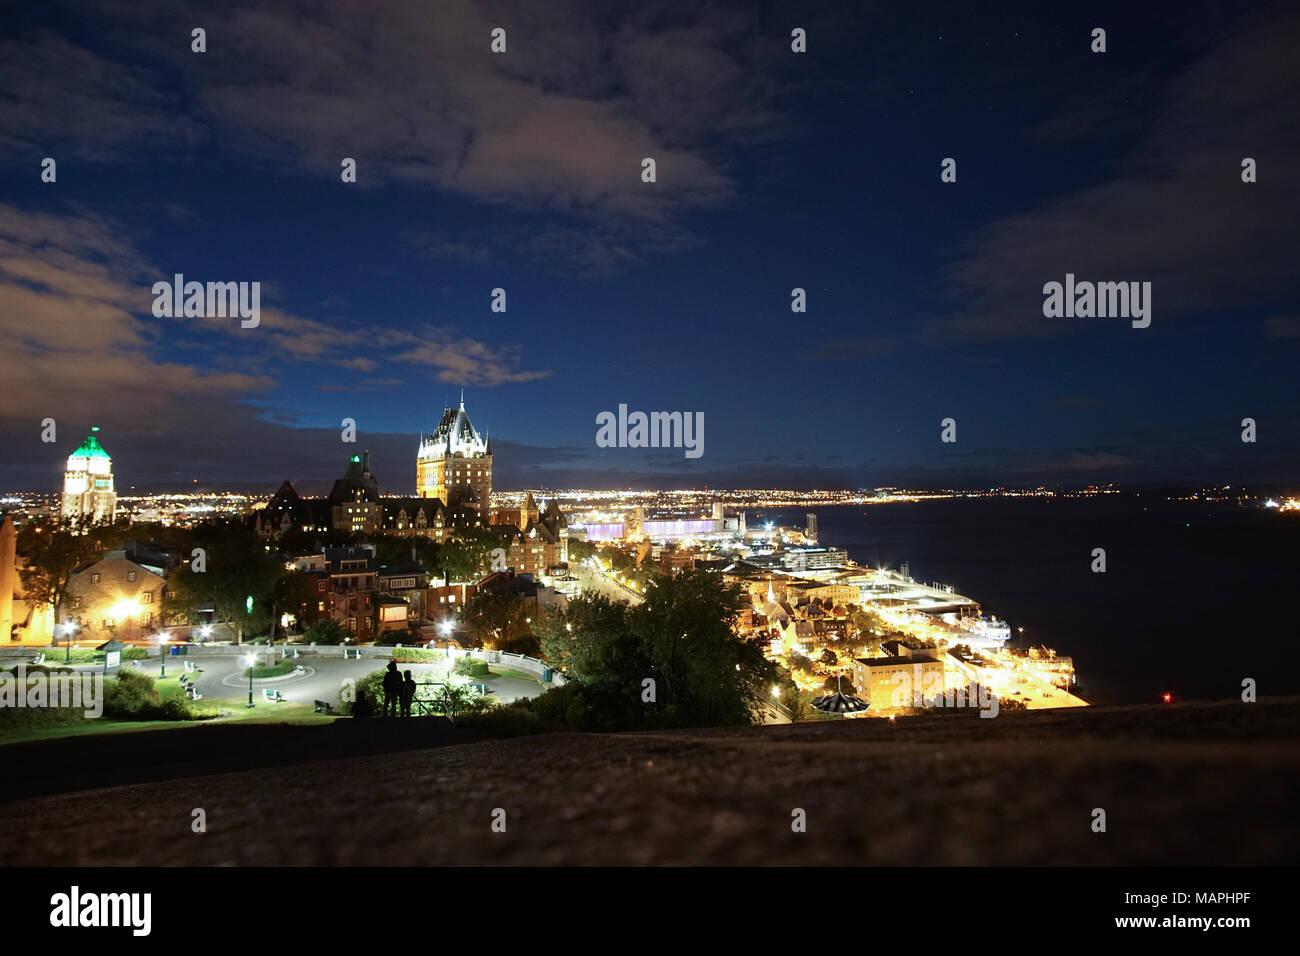 Quebec Vista Nocturna De Larga Exposición Foto Imagen De Stock